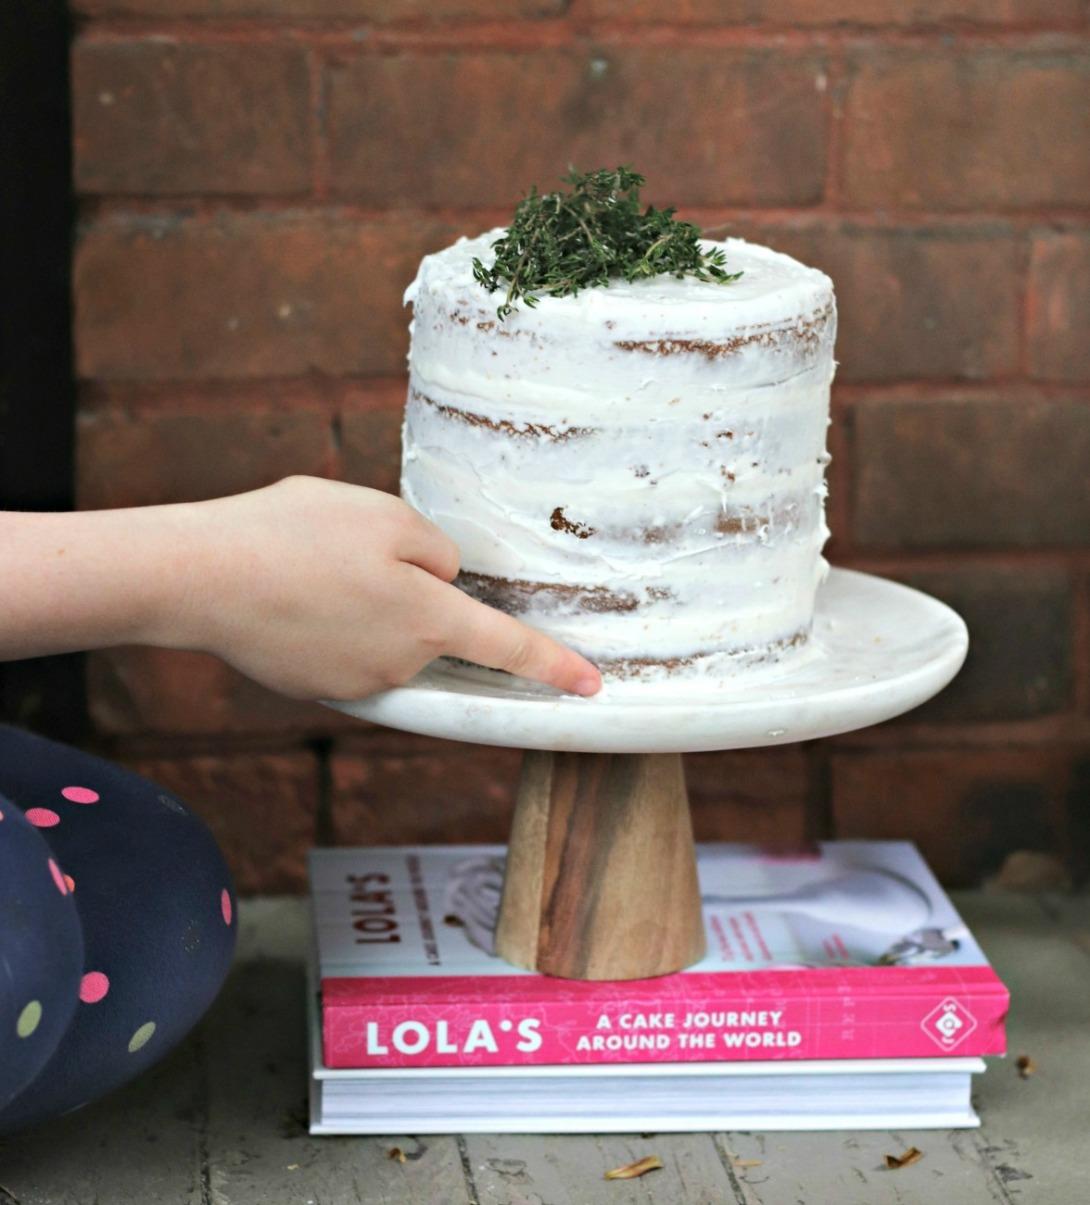 Lola's A Cake Journey Around the World carrot cake swiping